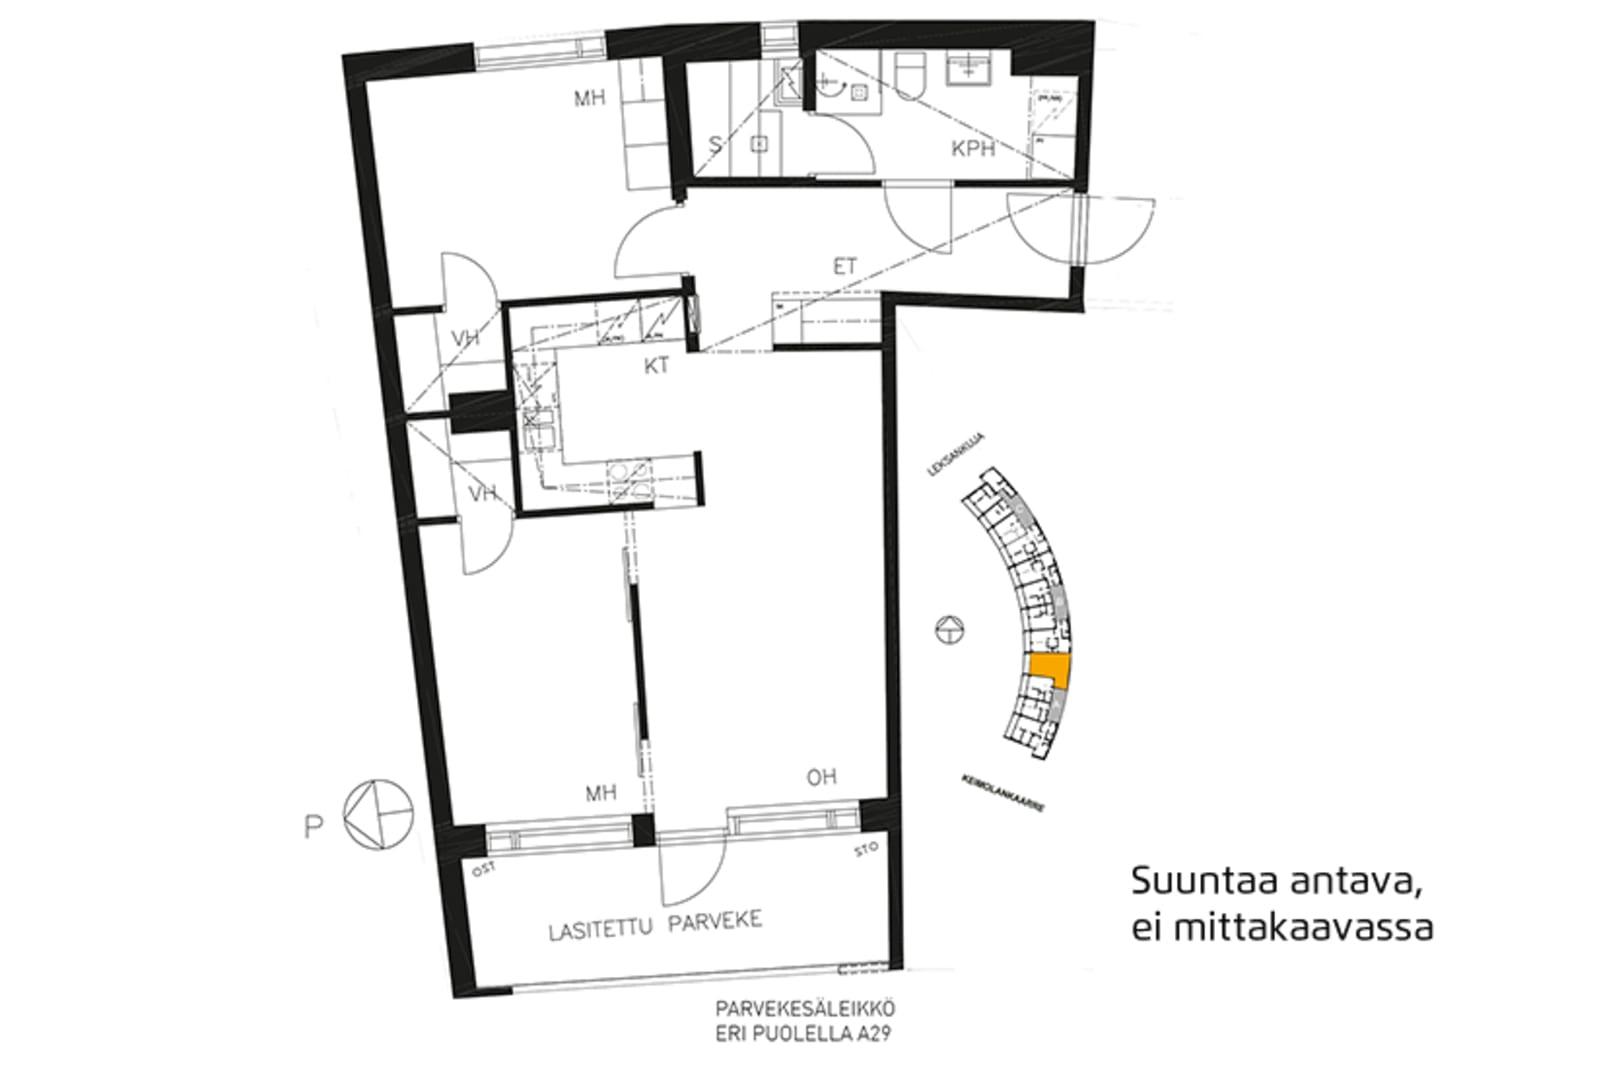 Vantaa, Keimolanmäki, Leksankuja 3 A 025